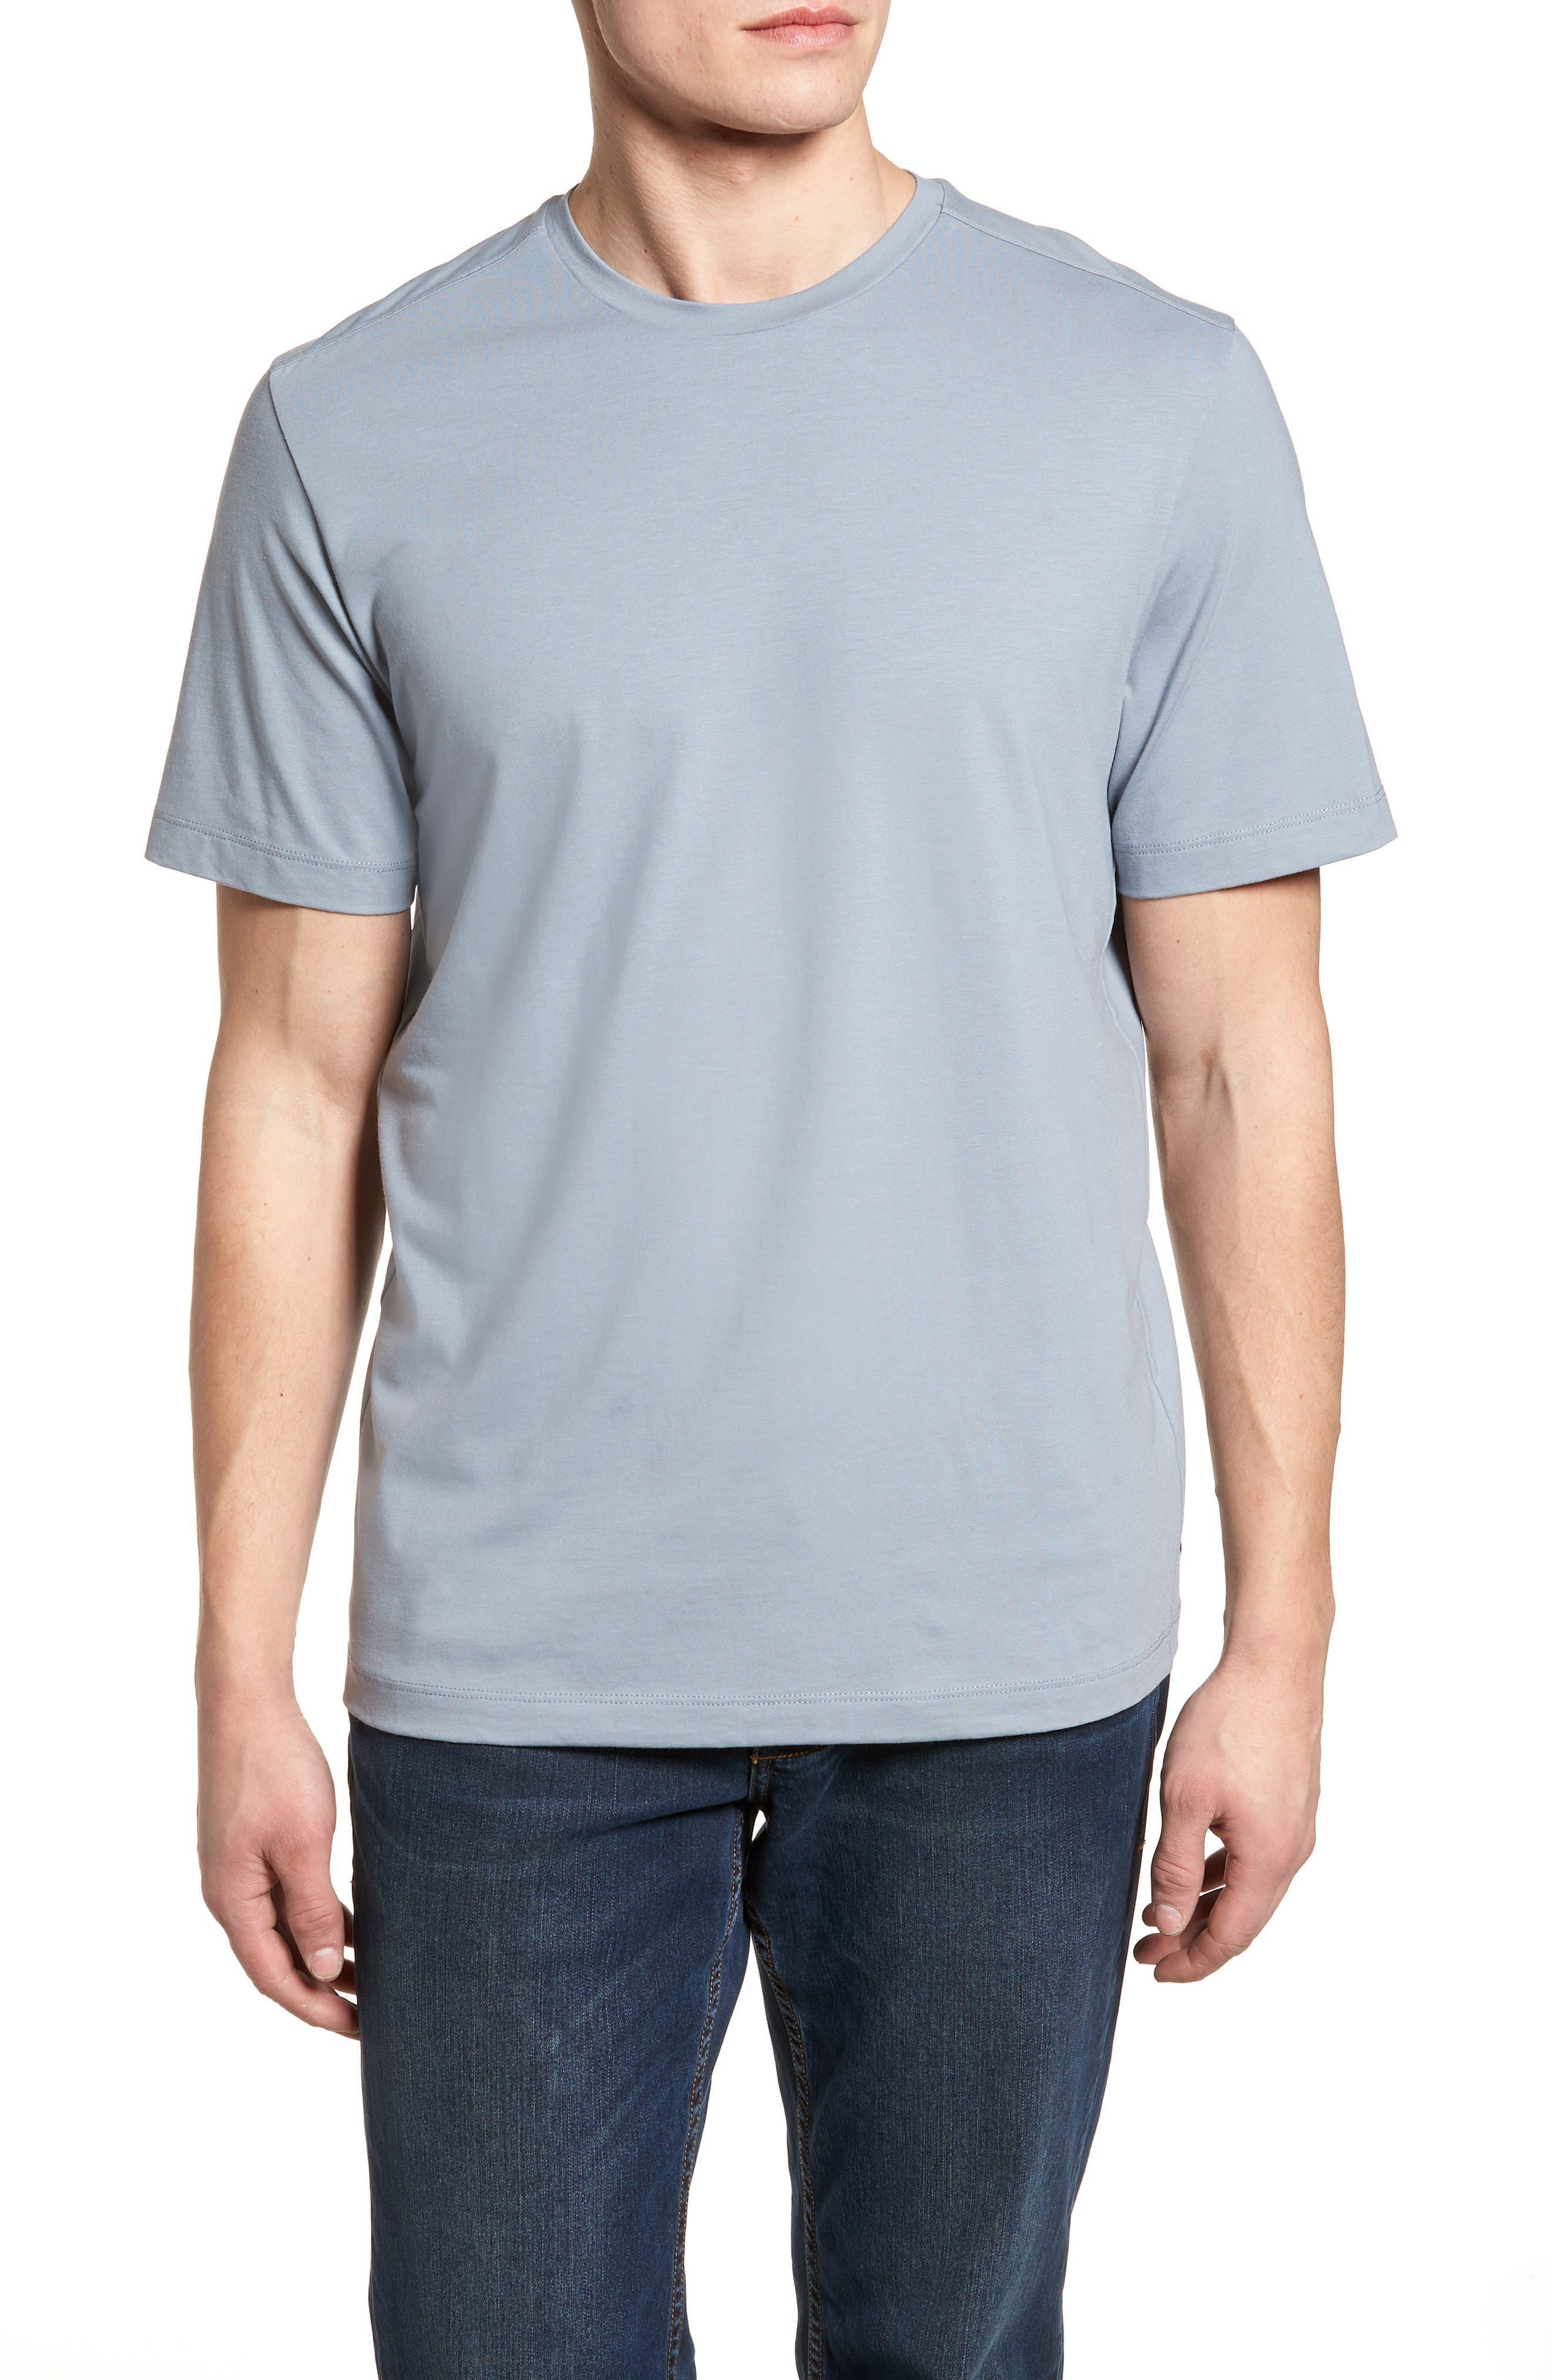 Tropicool T-Shirt,                             Main thumbnail 1, color,                             050